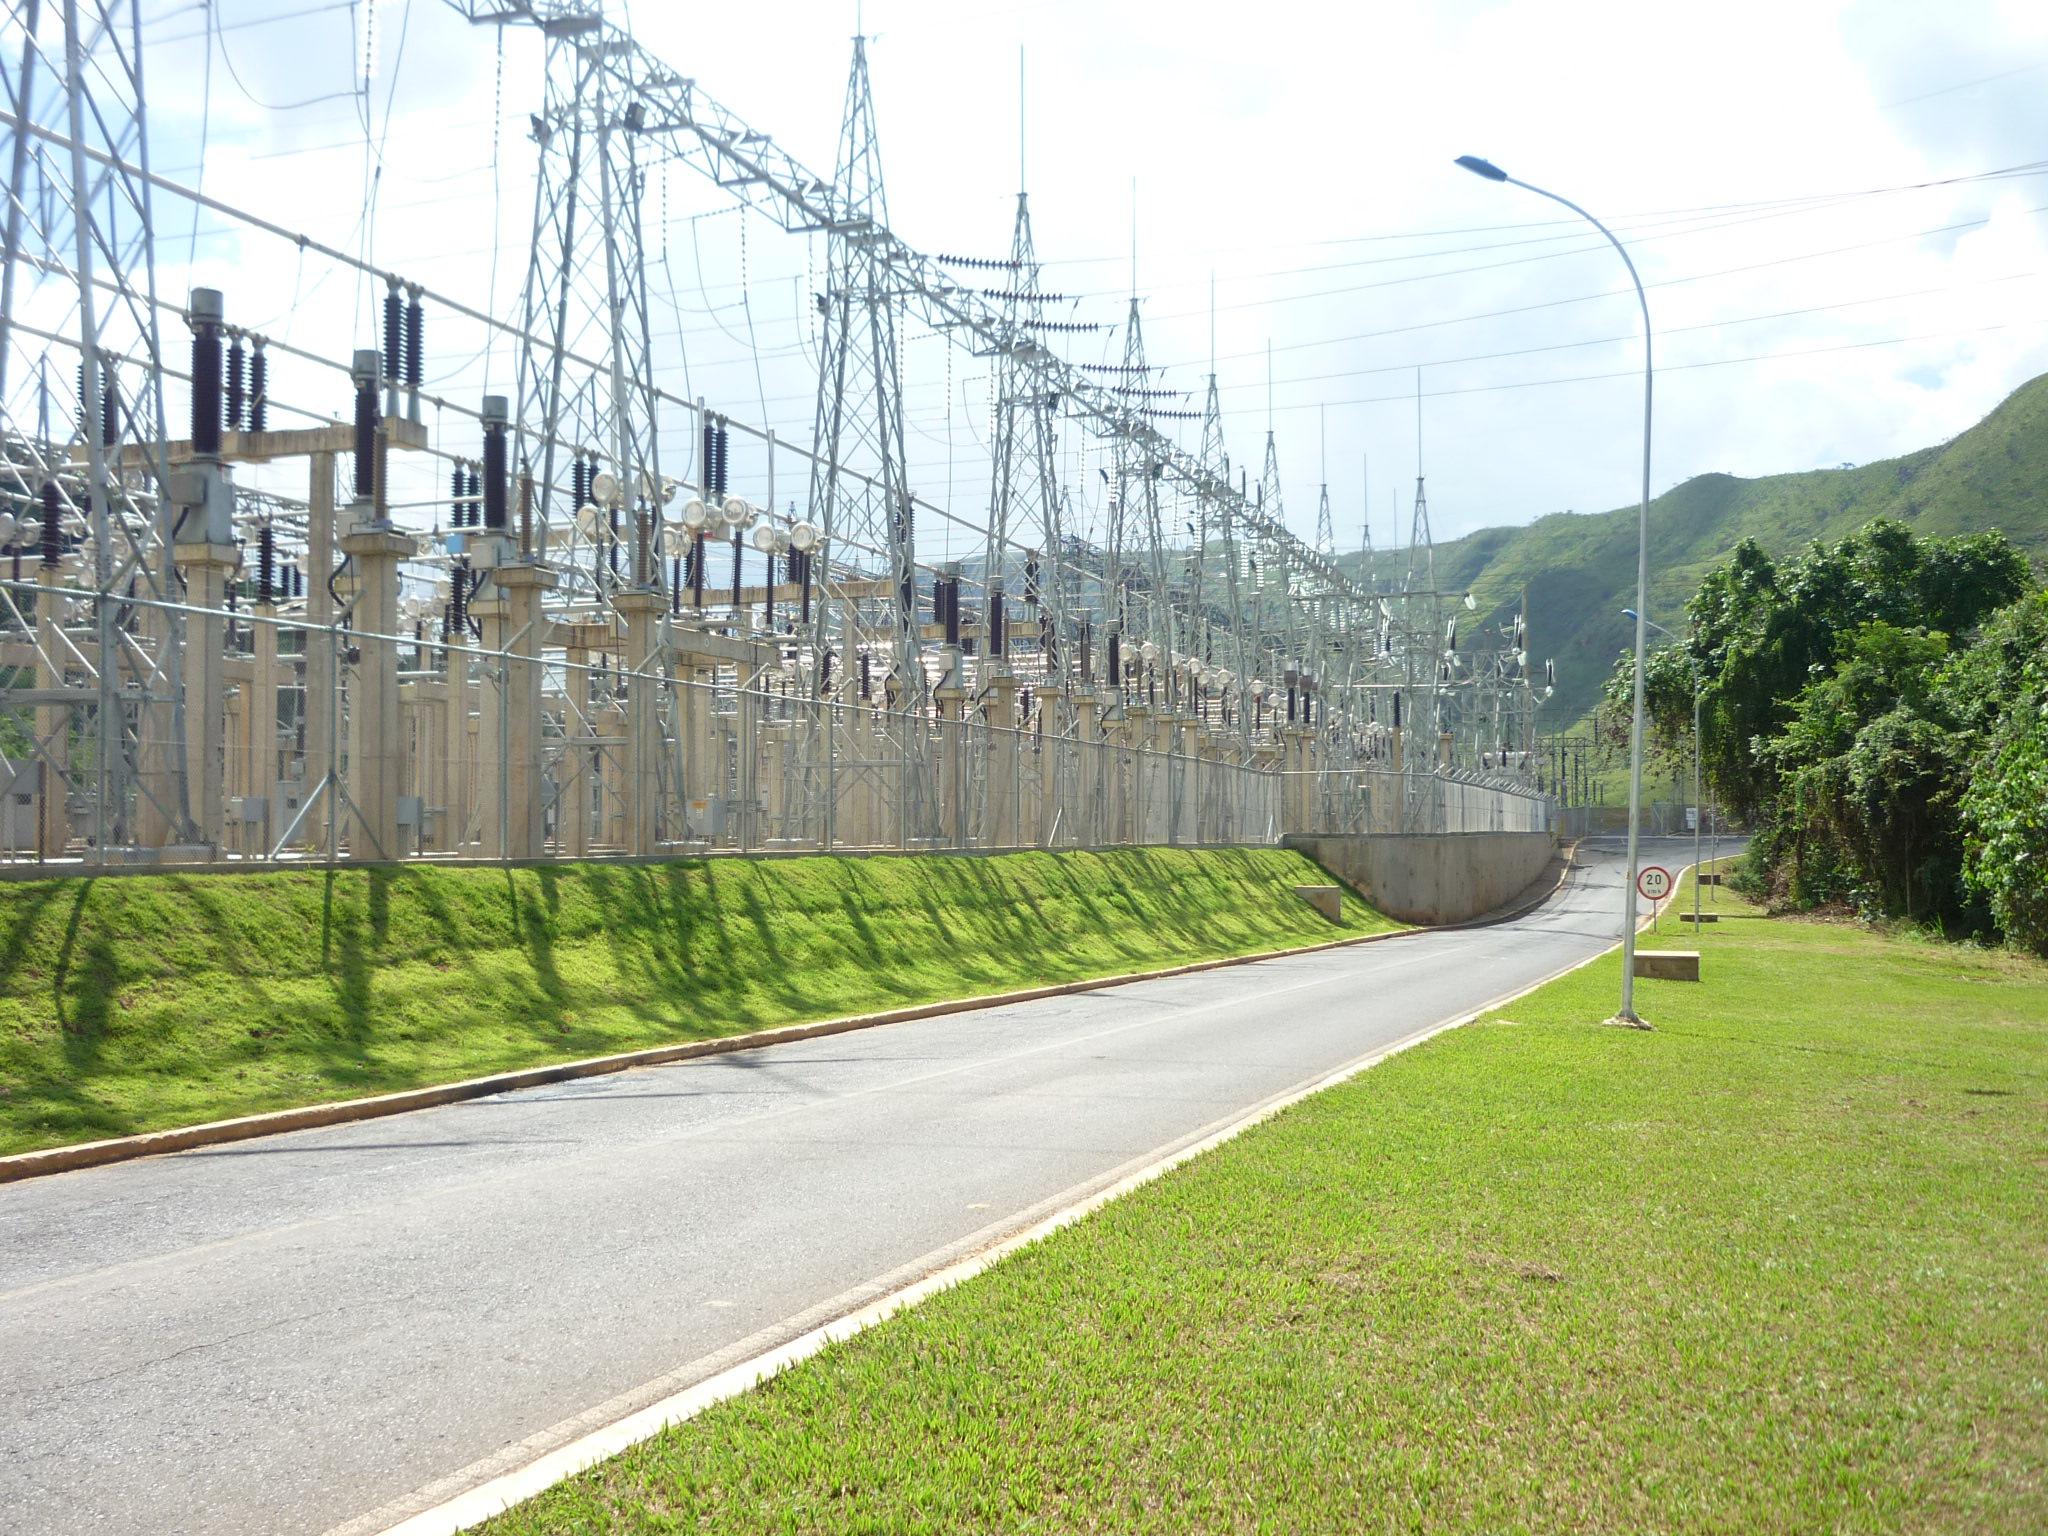 SE Mascarenha Moraes 345 kV